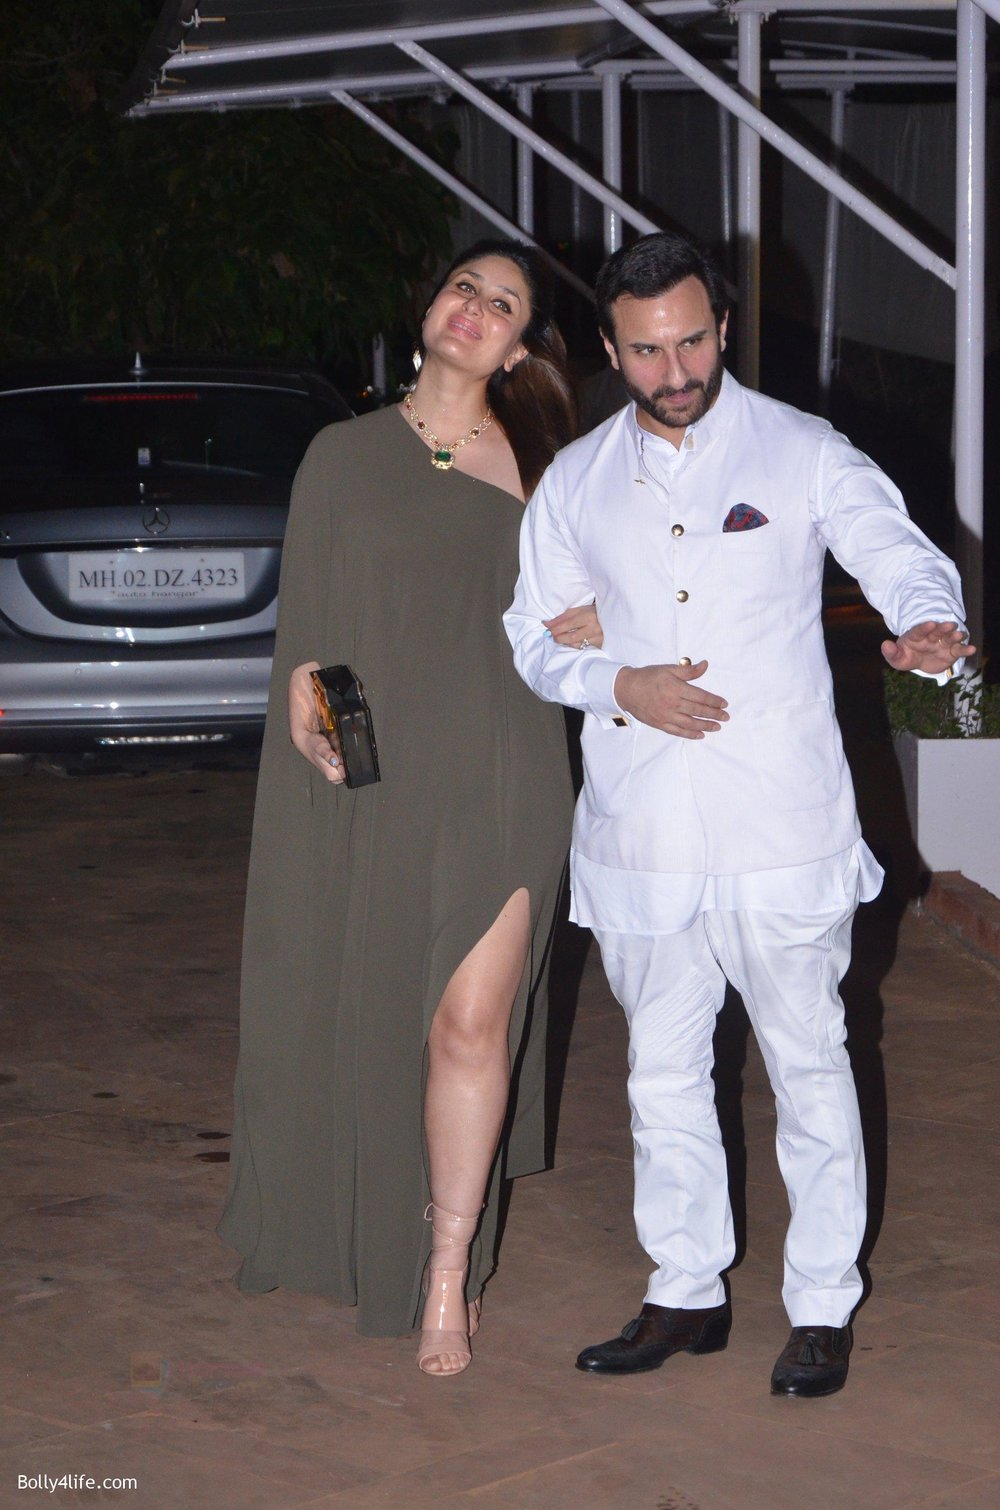 Saif-Ali-Khan-Kareena-Kapoor-at-Reema-jain-bday-party-in-Amadeus-NCPA-on-28th-Sept-2016-869.jpg